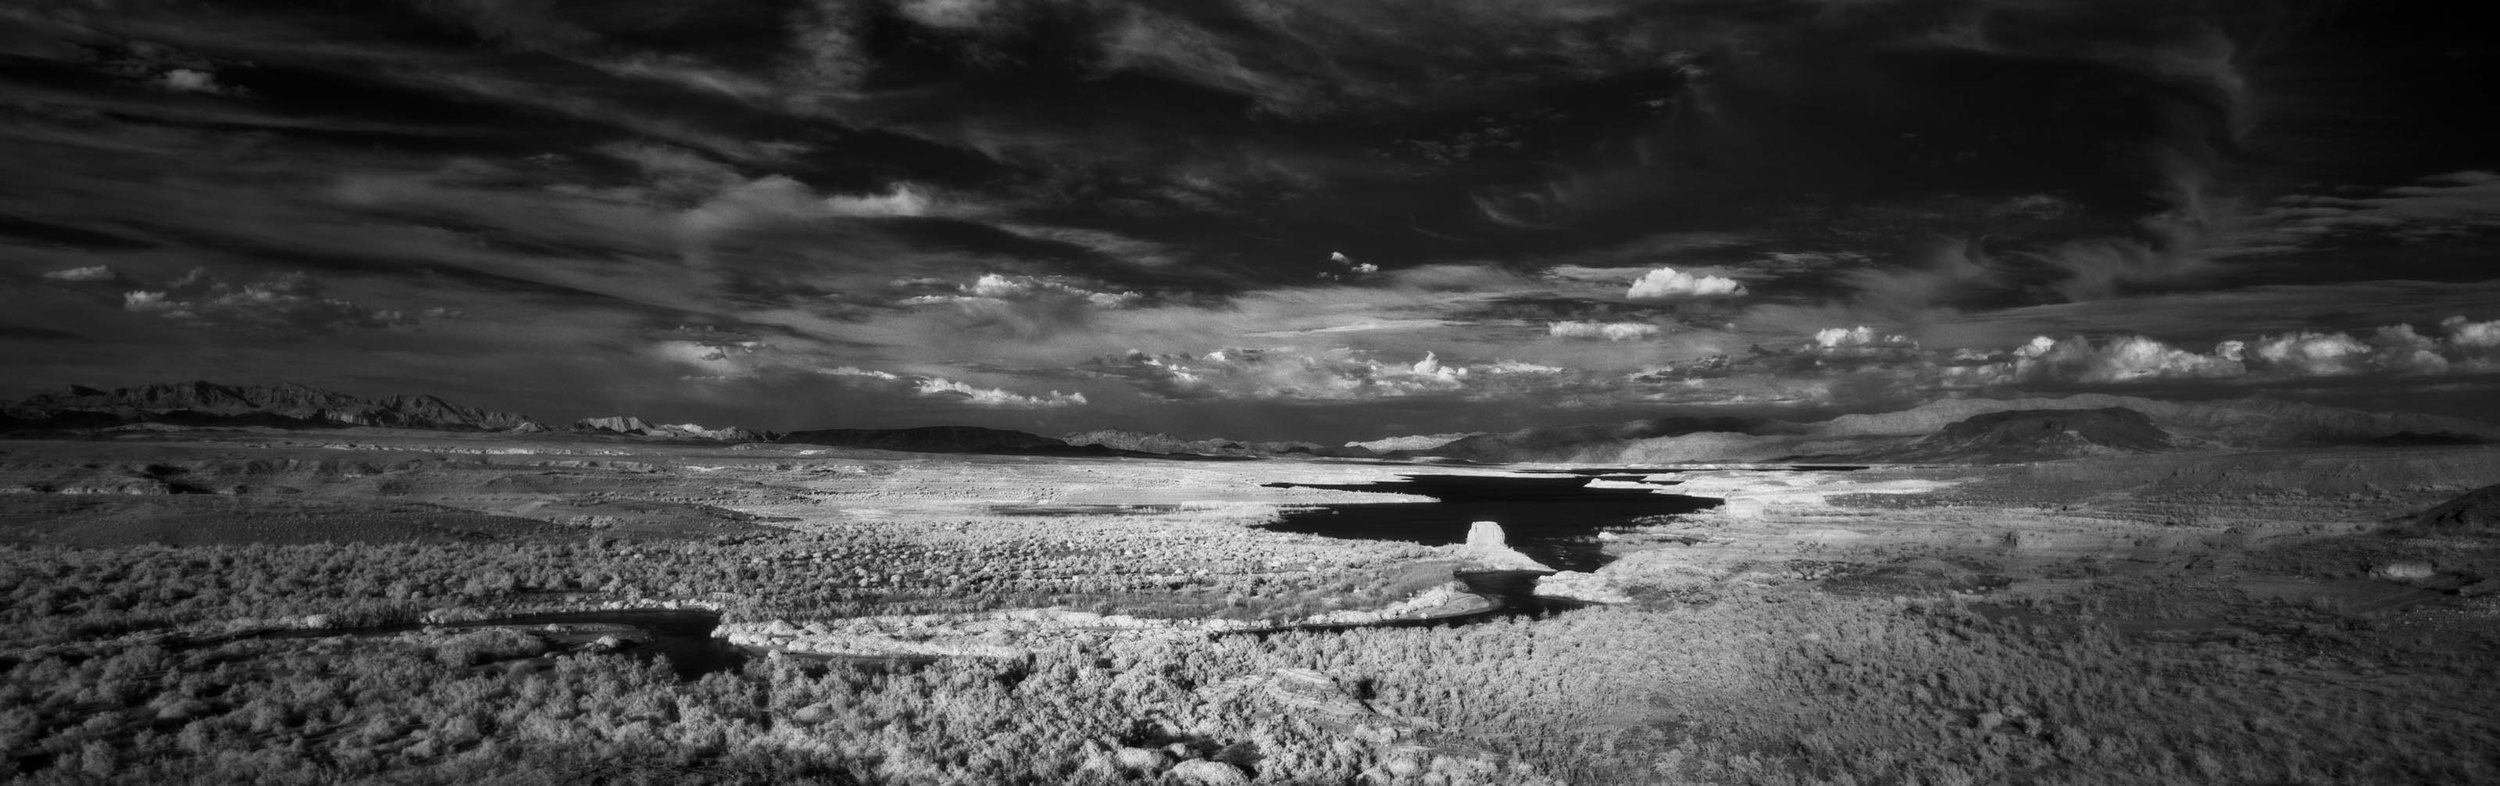 Las Vegas Wash into Lake Mead #1